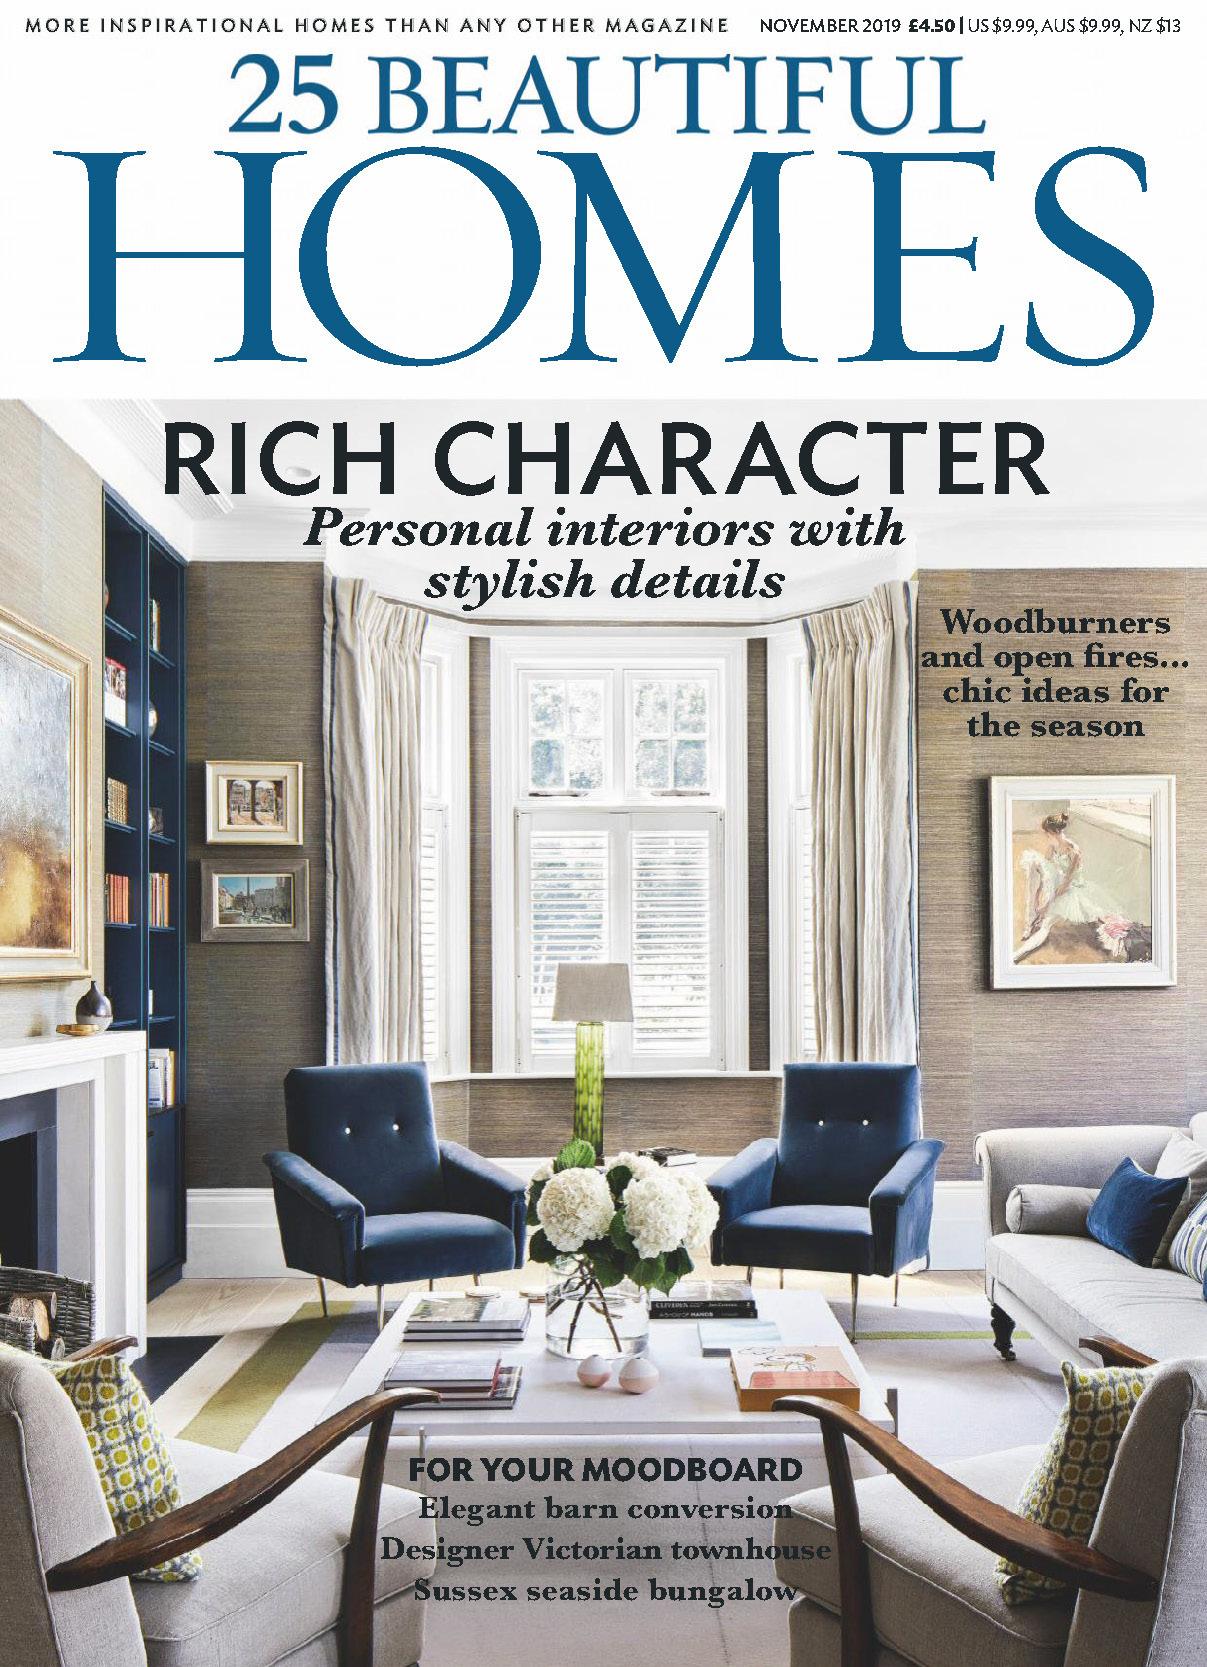 《25 Beautiful Homes》英国版时尚家居设计杂志2019年11月号